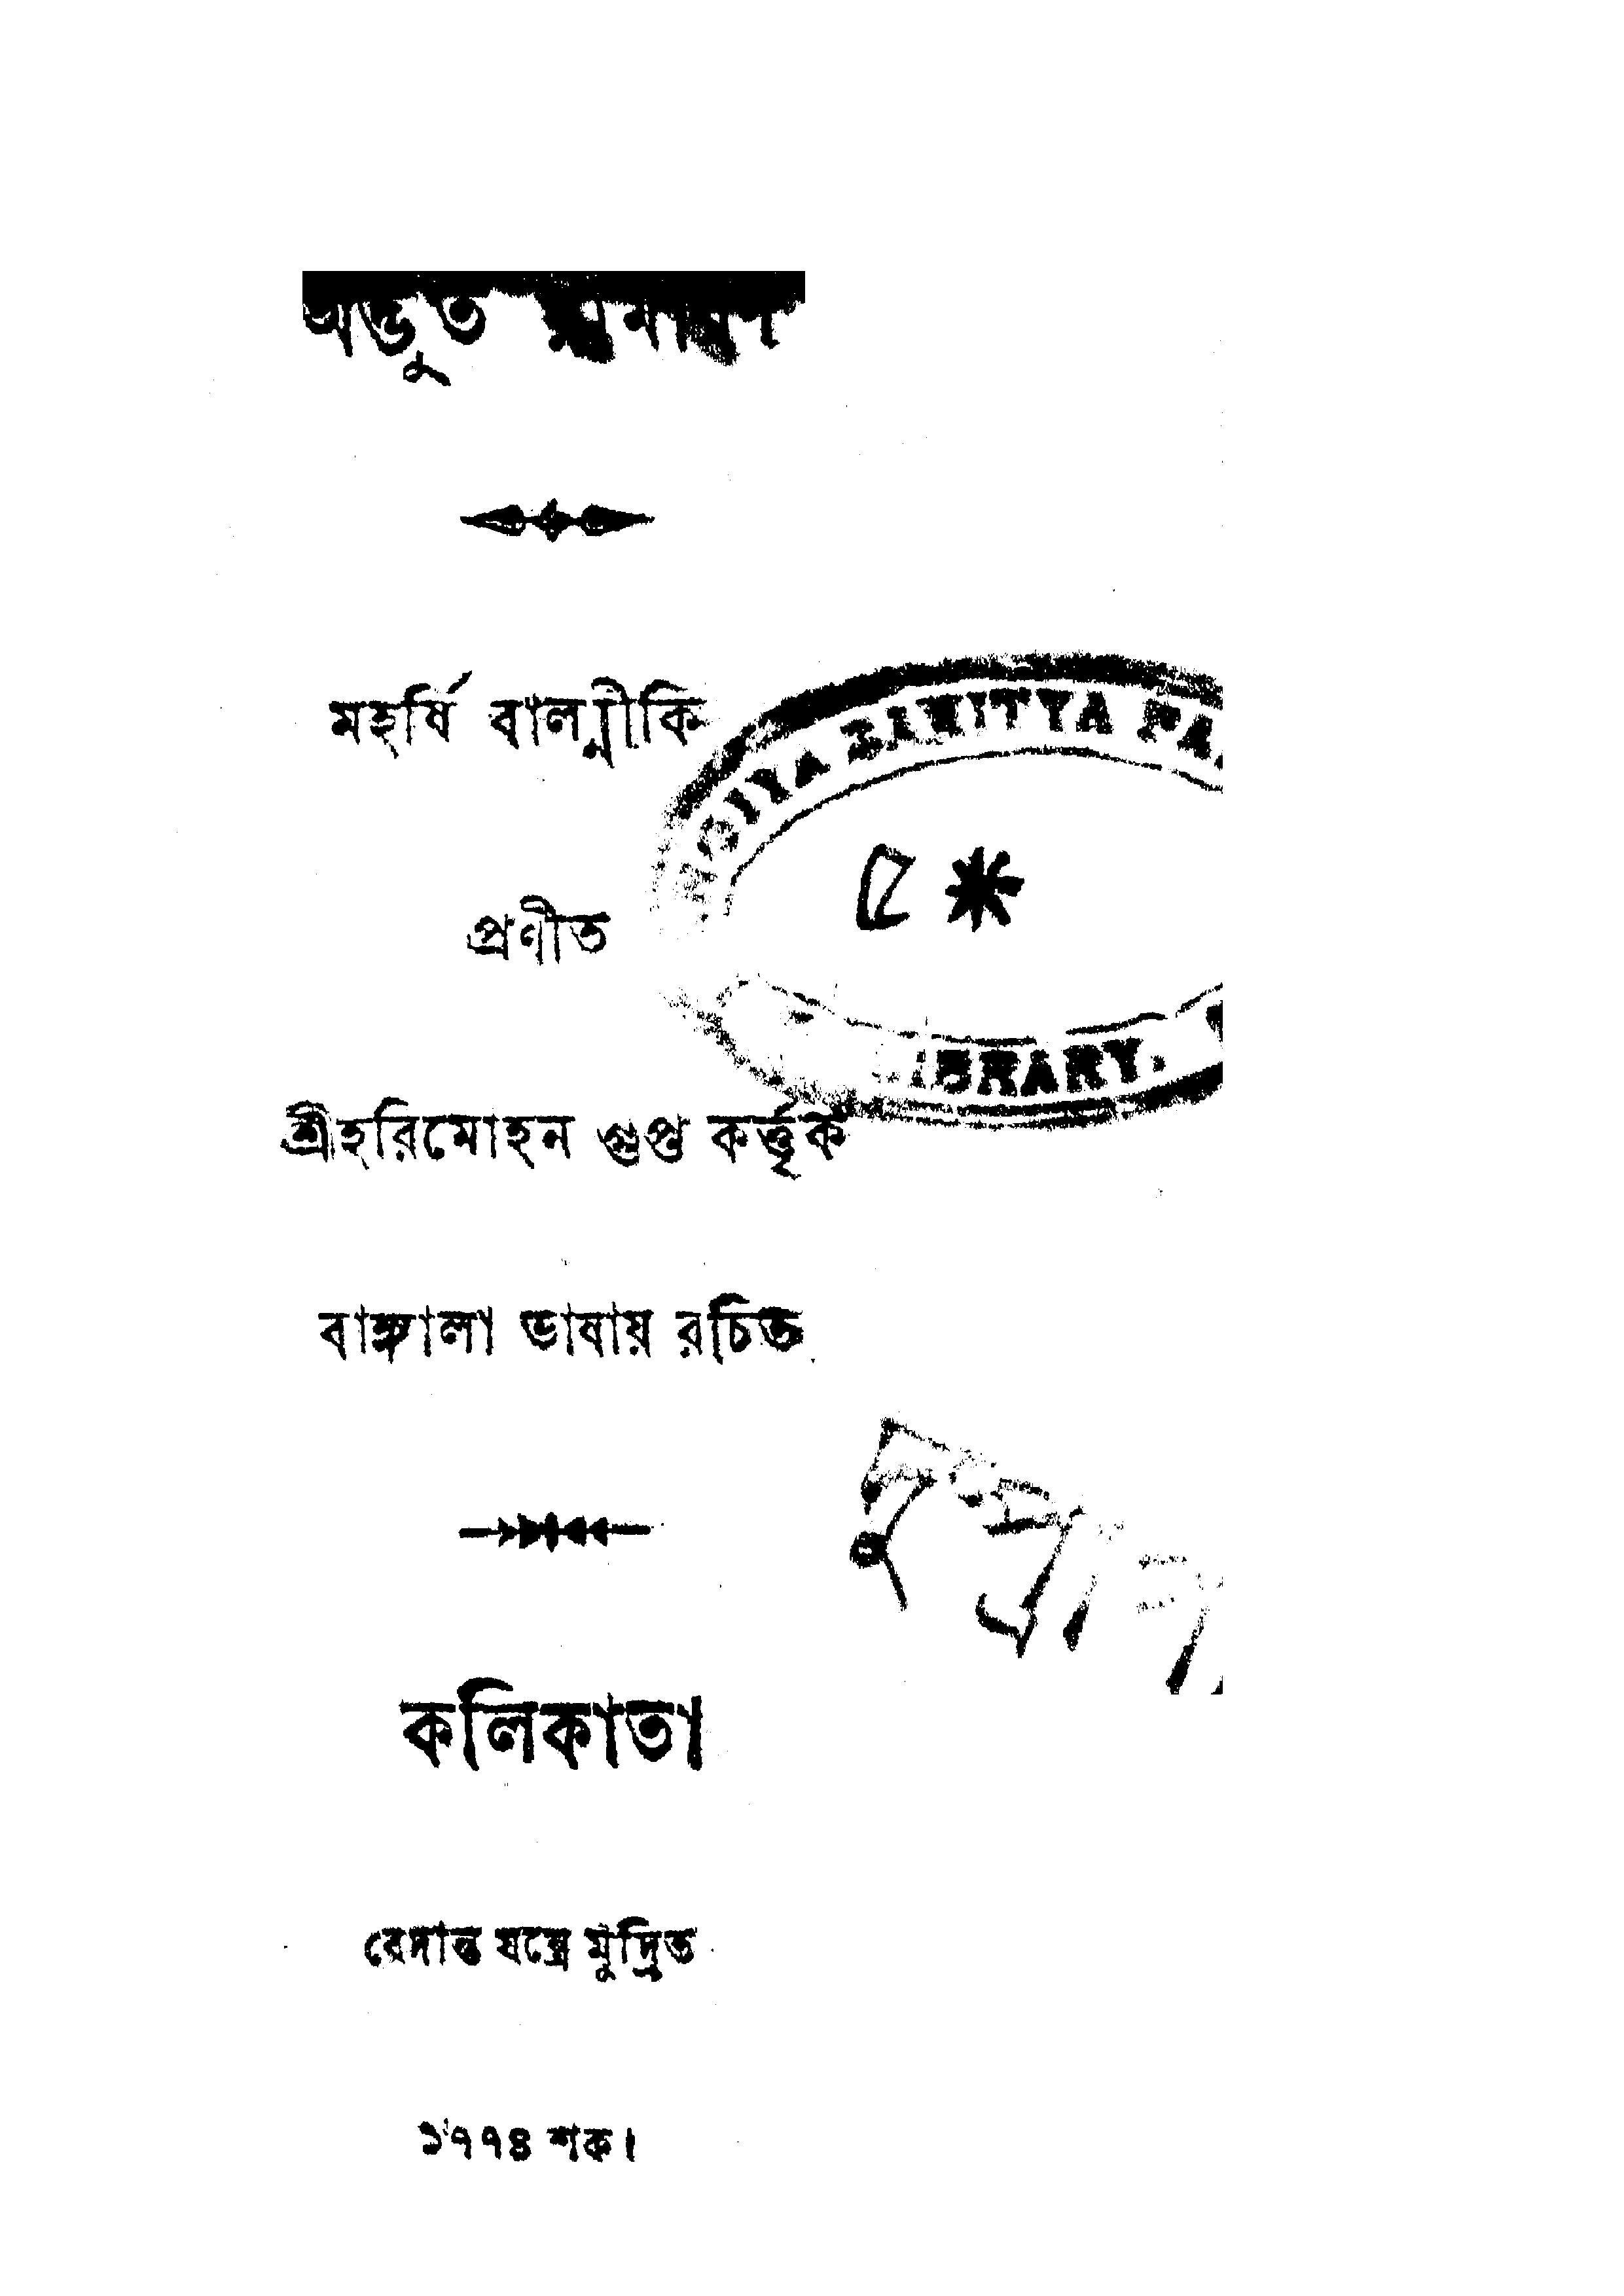 File:অদ্ভুত রামায়ণ - হরিমোহন গুপ্ত